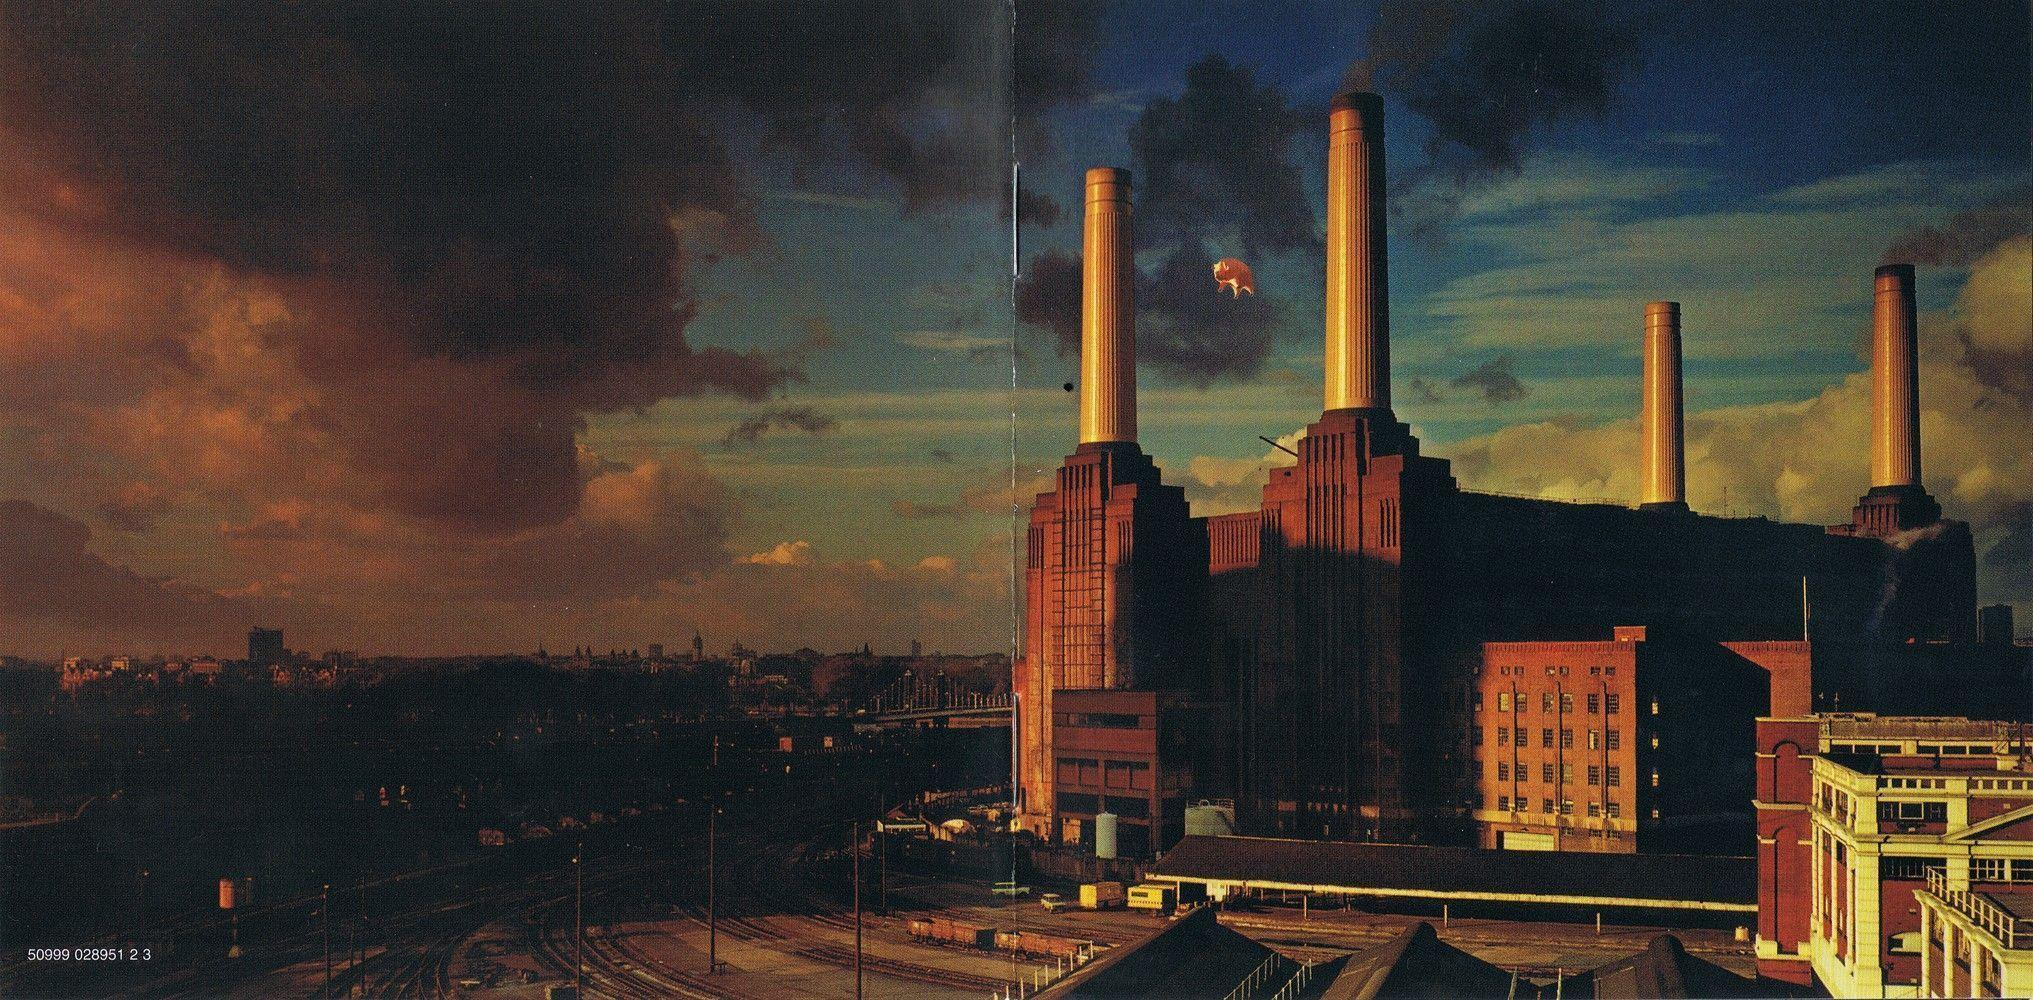 Pink Floyd Animals Wallpapers - Wallpaper Cave  Pink Floyd Anim...